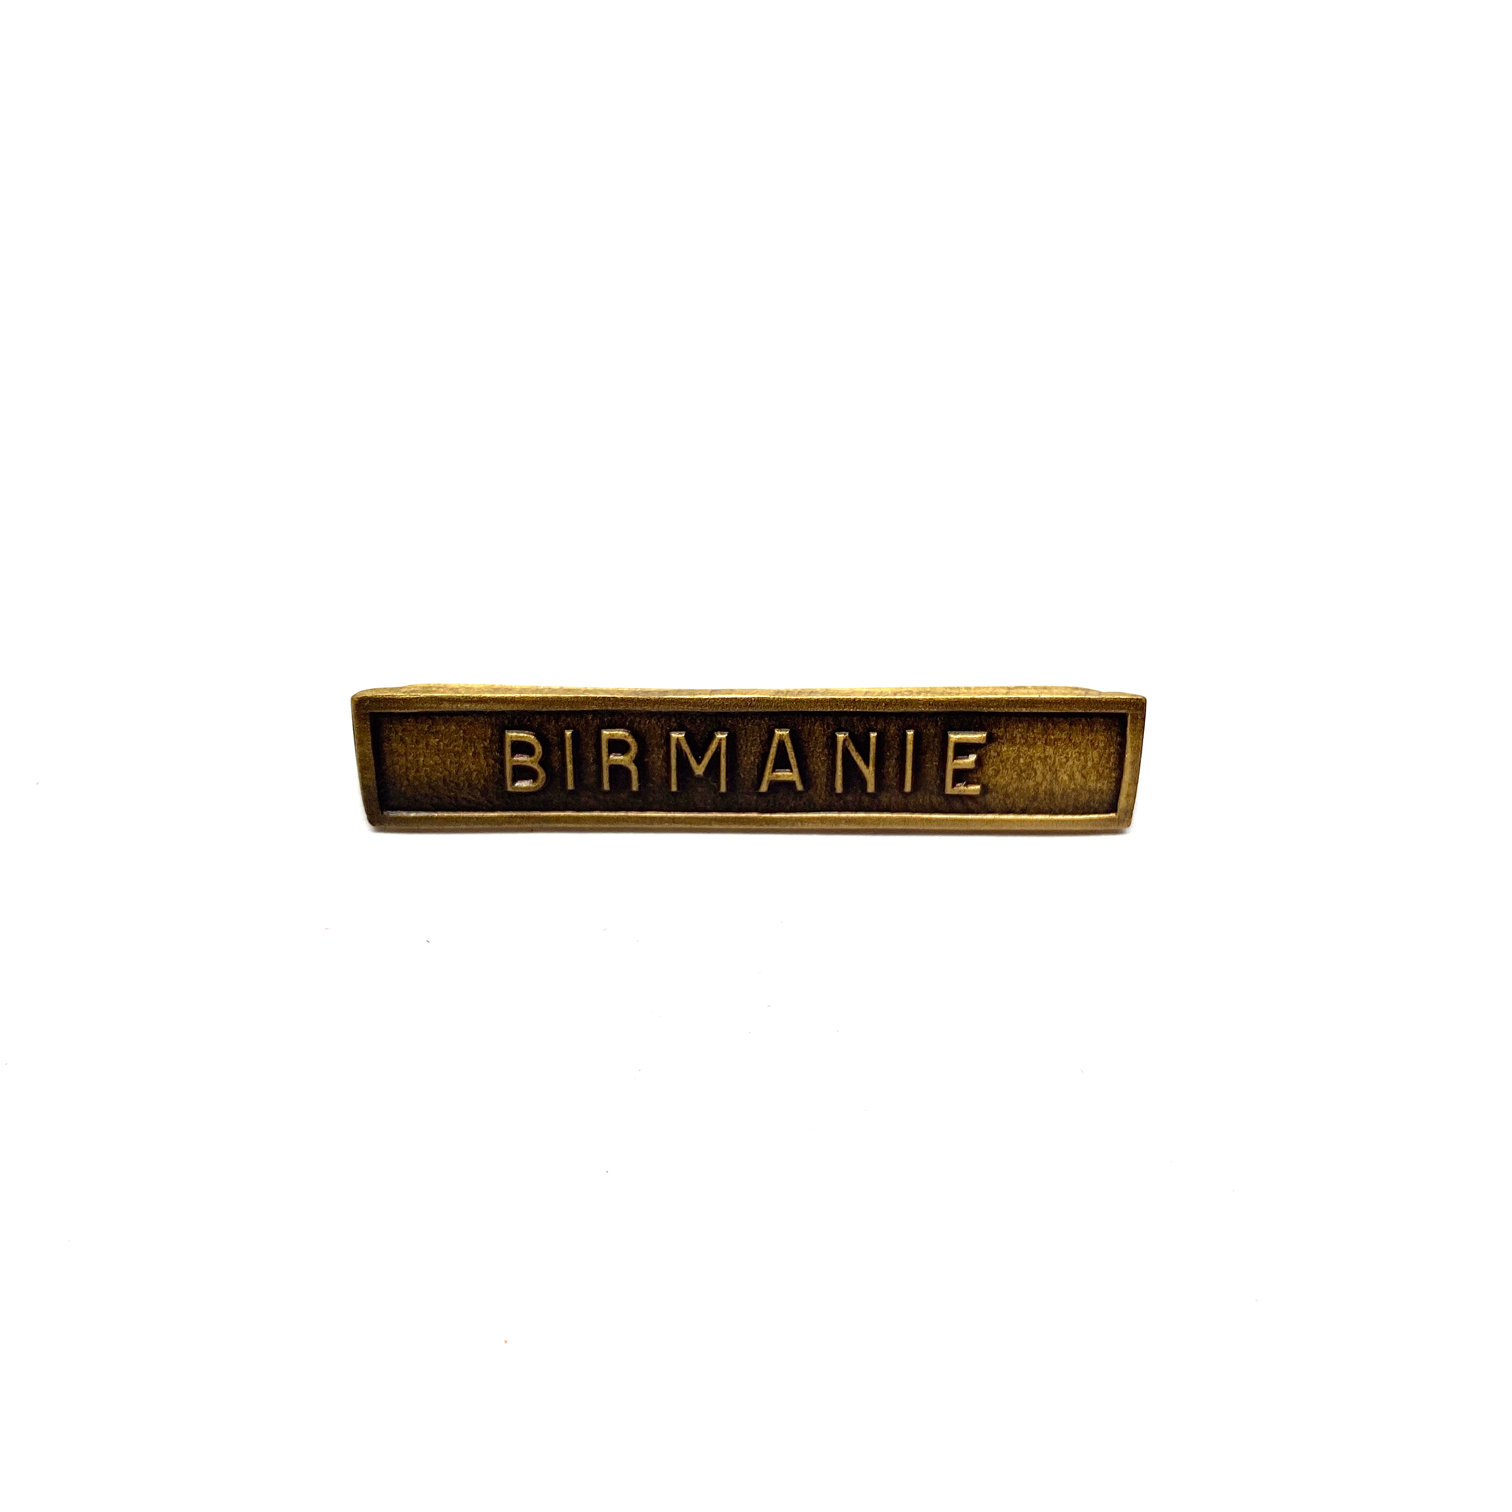 Bar Birmanie for war medals